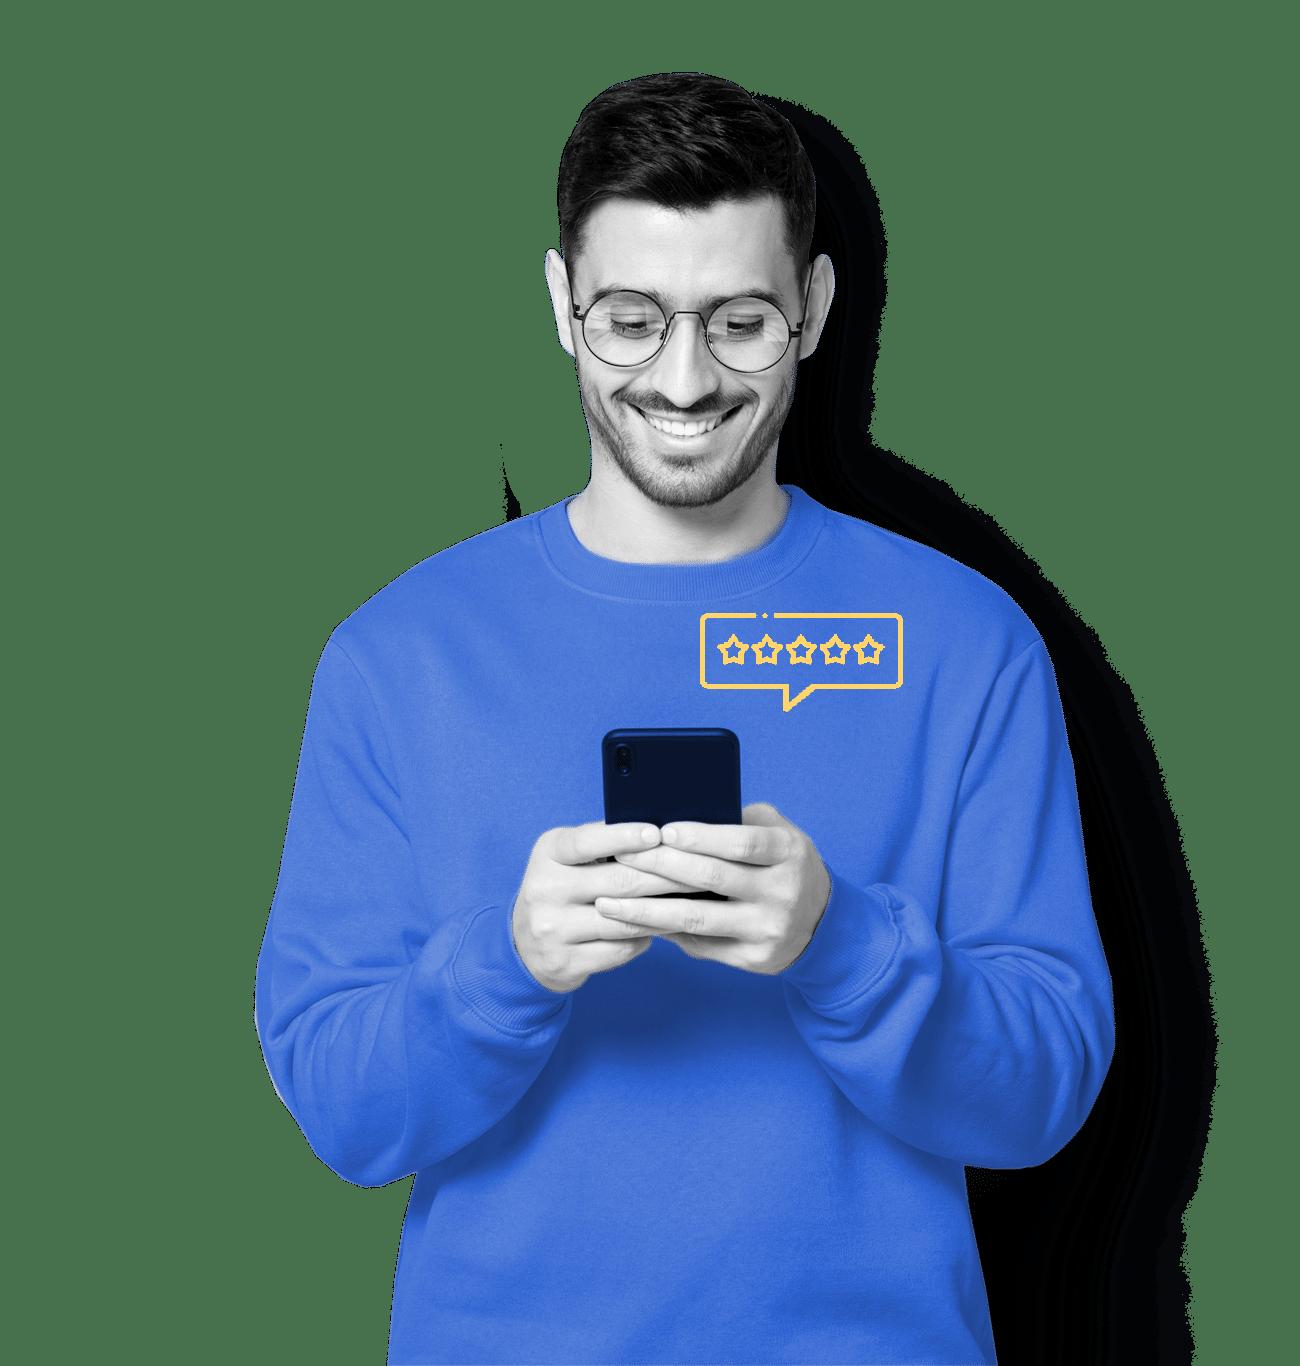 CX/VoC customer experience survey